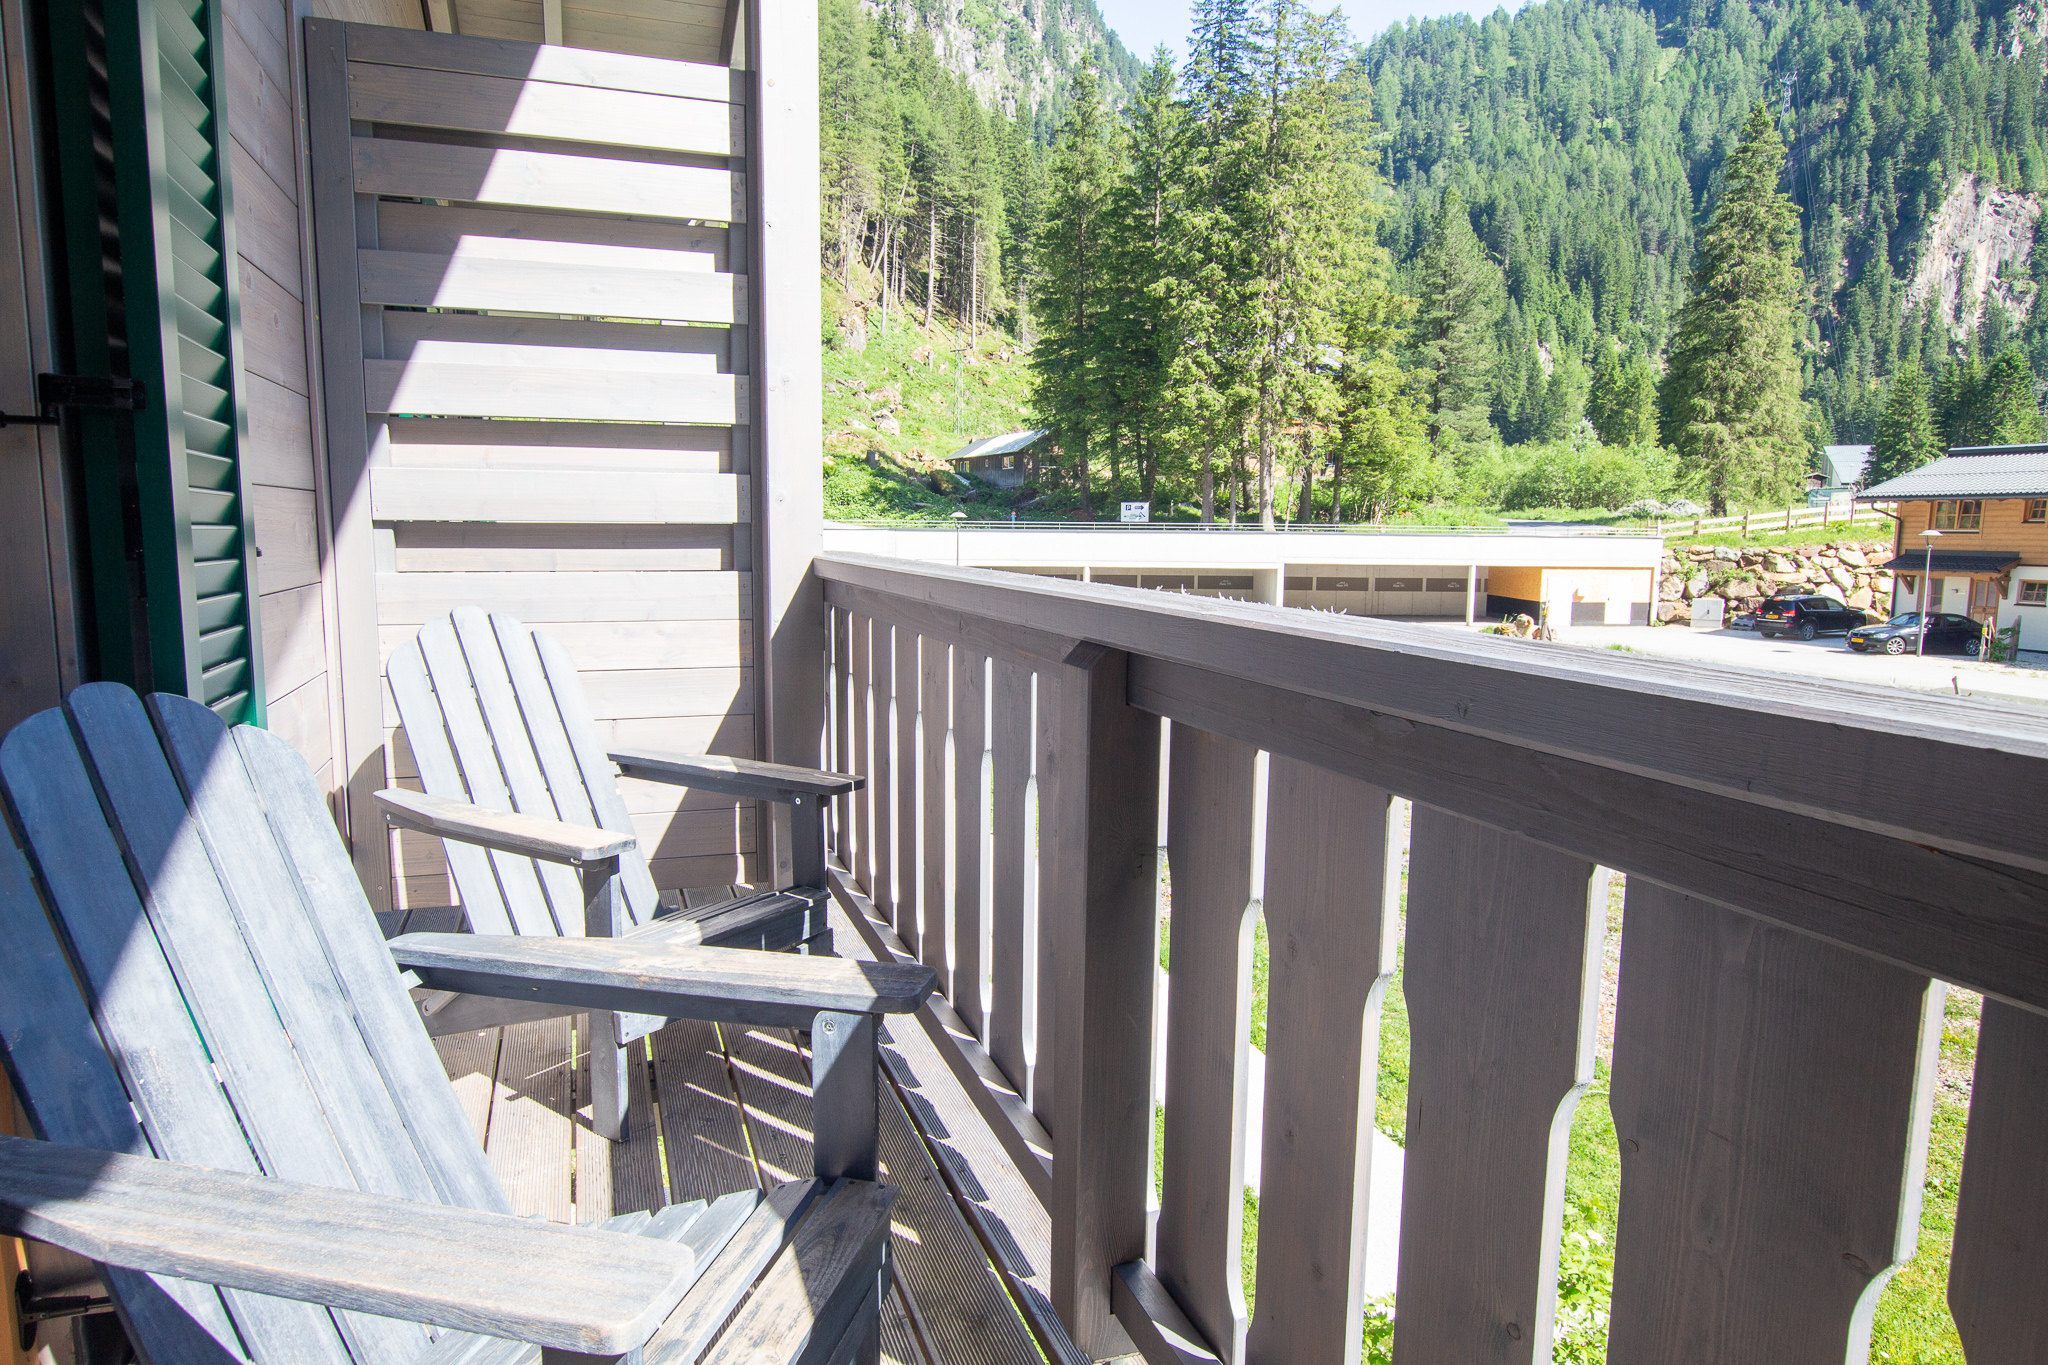 Maison de vacances Lodge Seeblick am Skilift und Bergsee für 5 (2636751), Uttendorf, Pinzgau, Salzbourg, Autriche, image 6